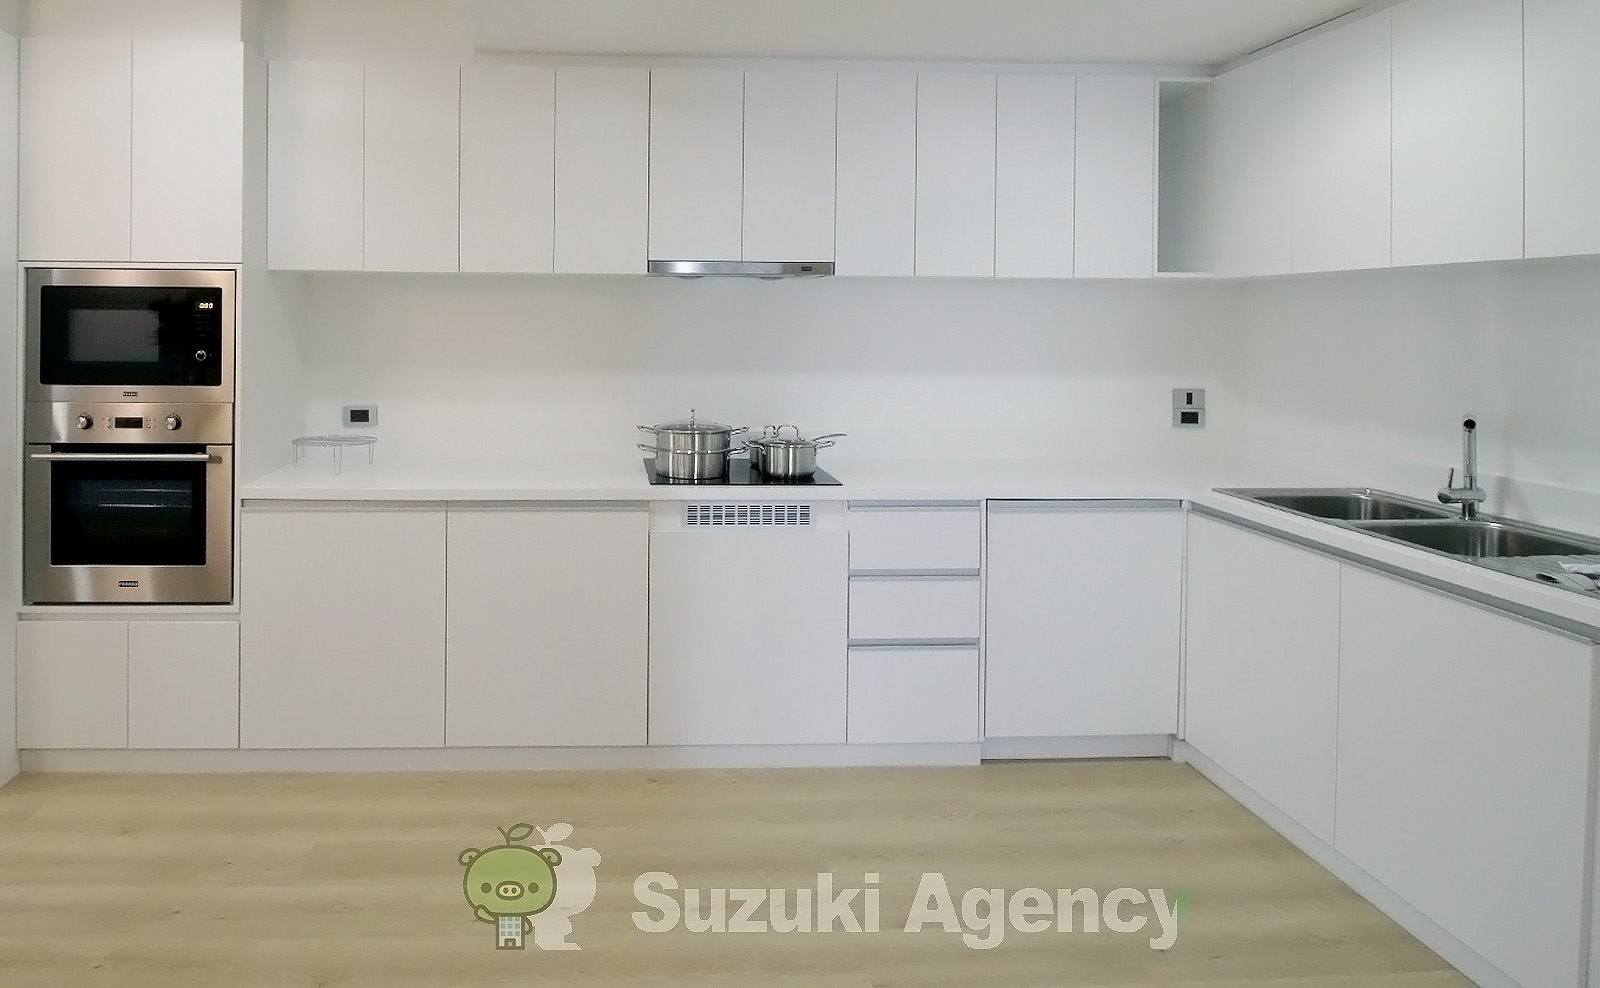 SuzukiRealEstate 「Chani Residence」Detail